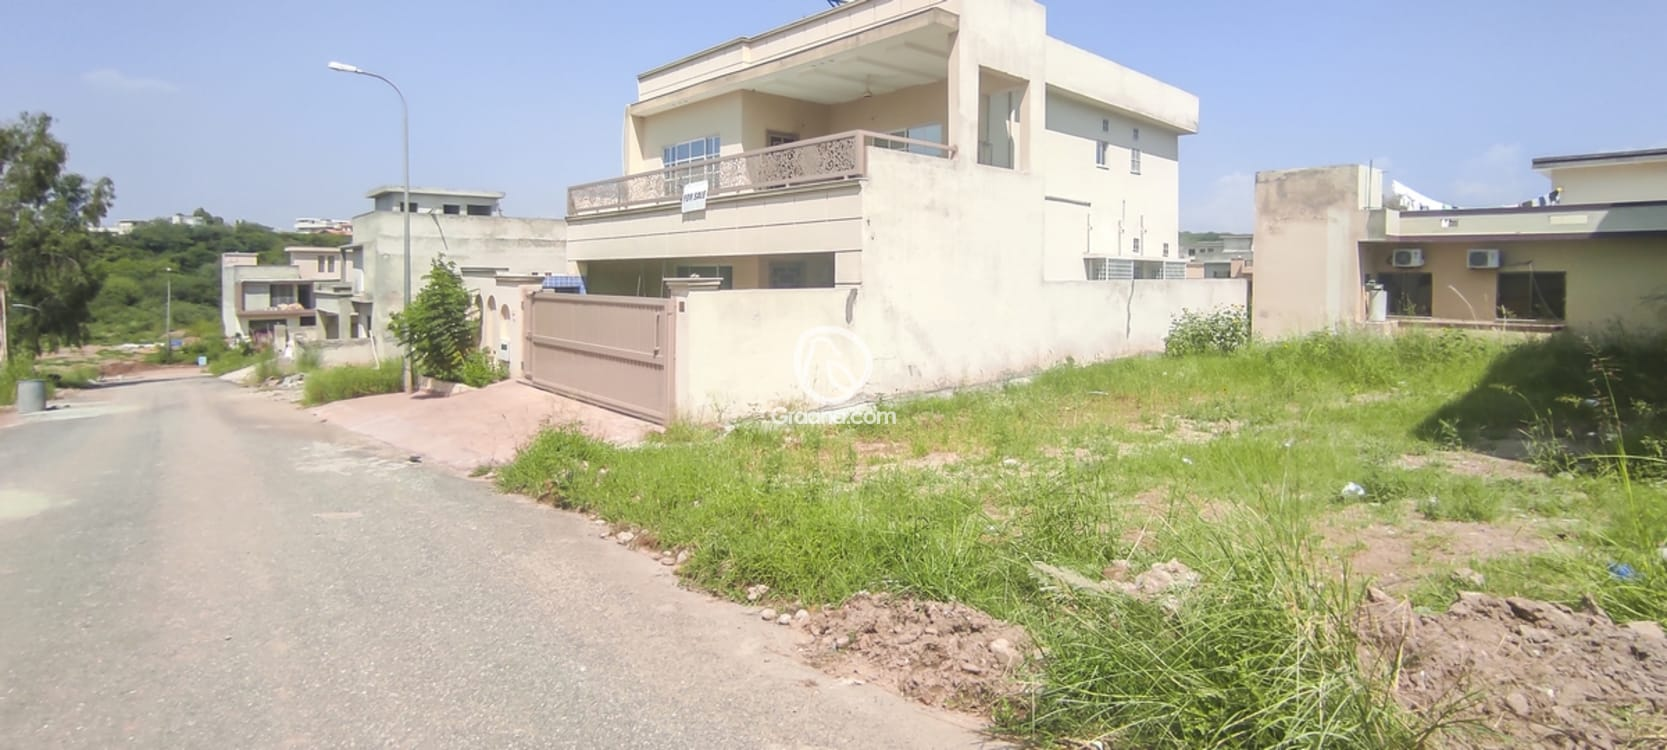 12 Marla Residential Plot For Sale | Graana.com